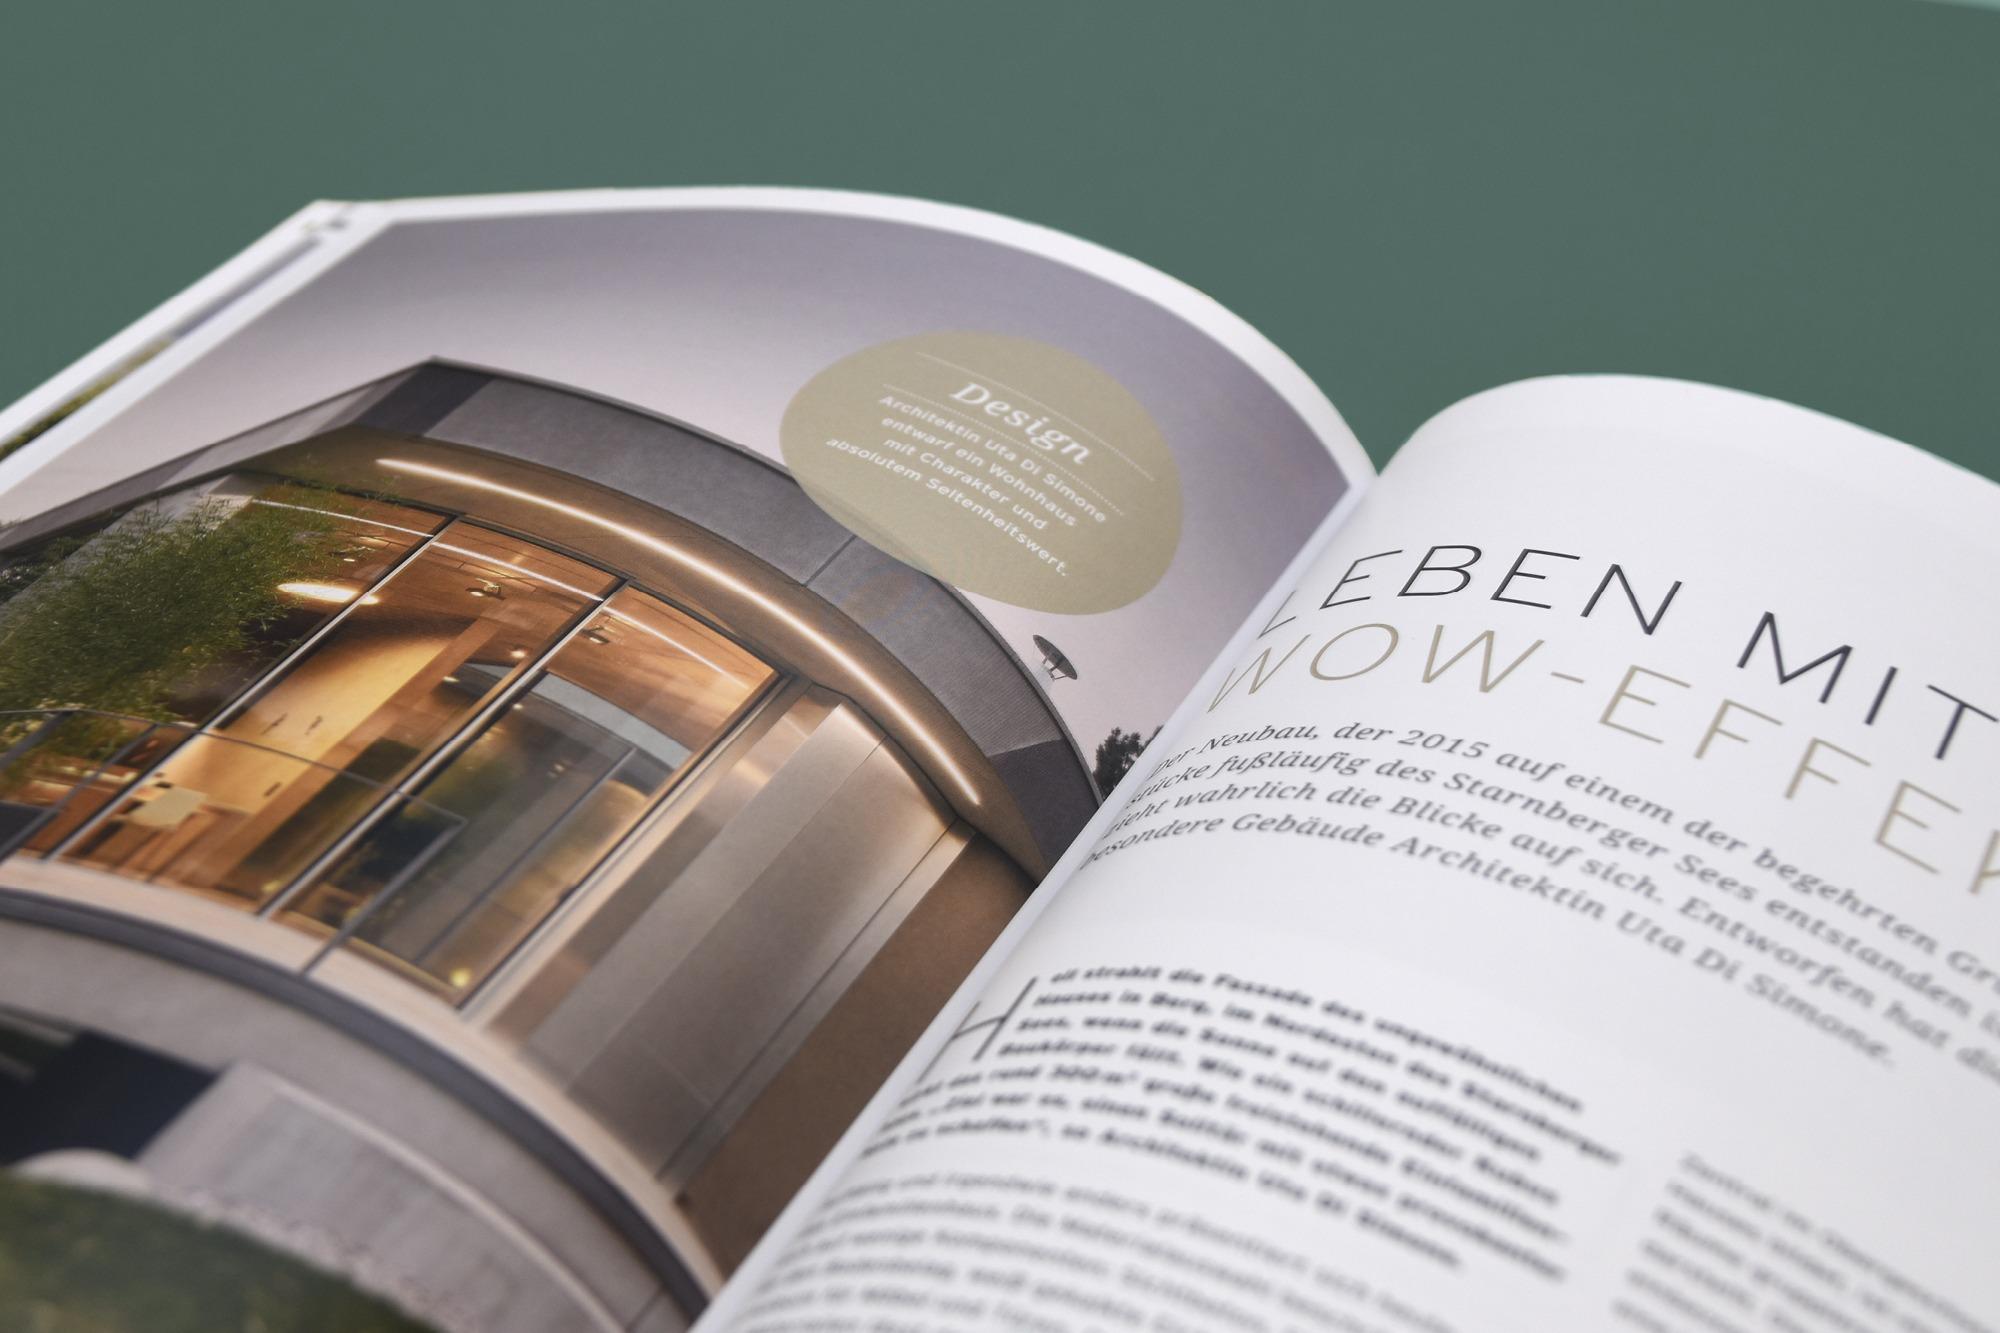 Studio dos, Grafikdesign Osnabrück, Solarlux Kundenmagazin Innenseite Detail